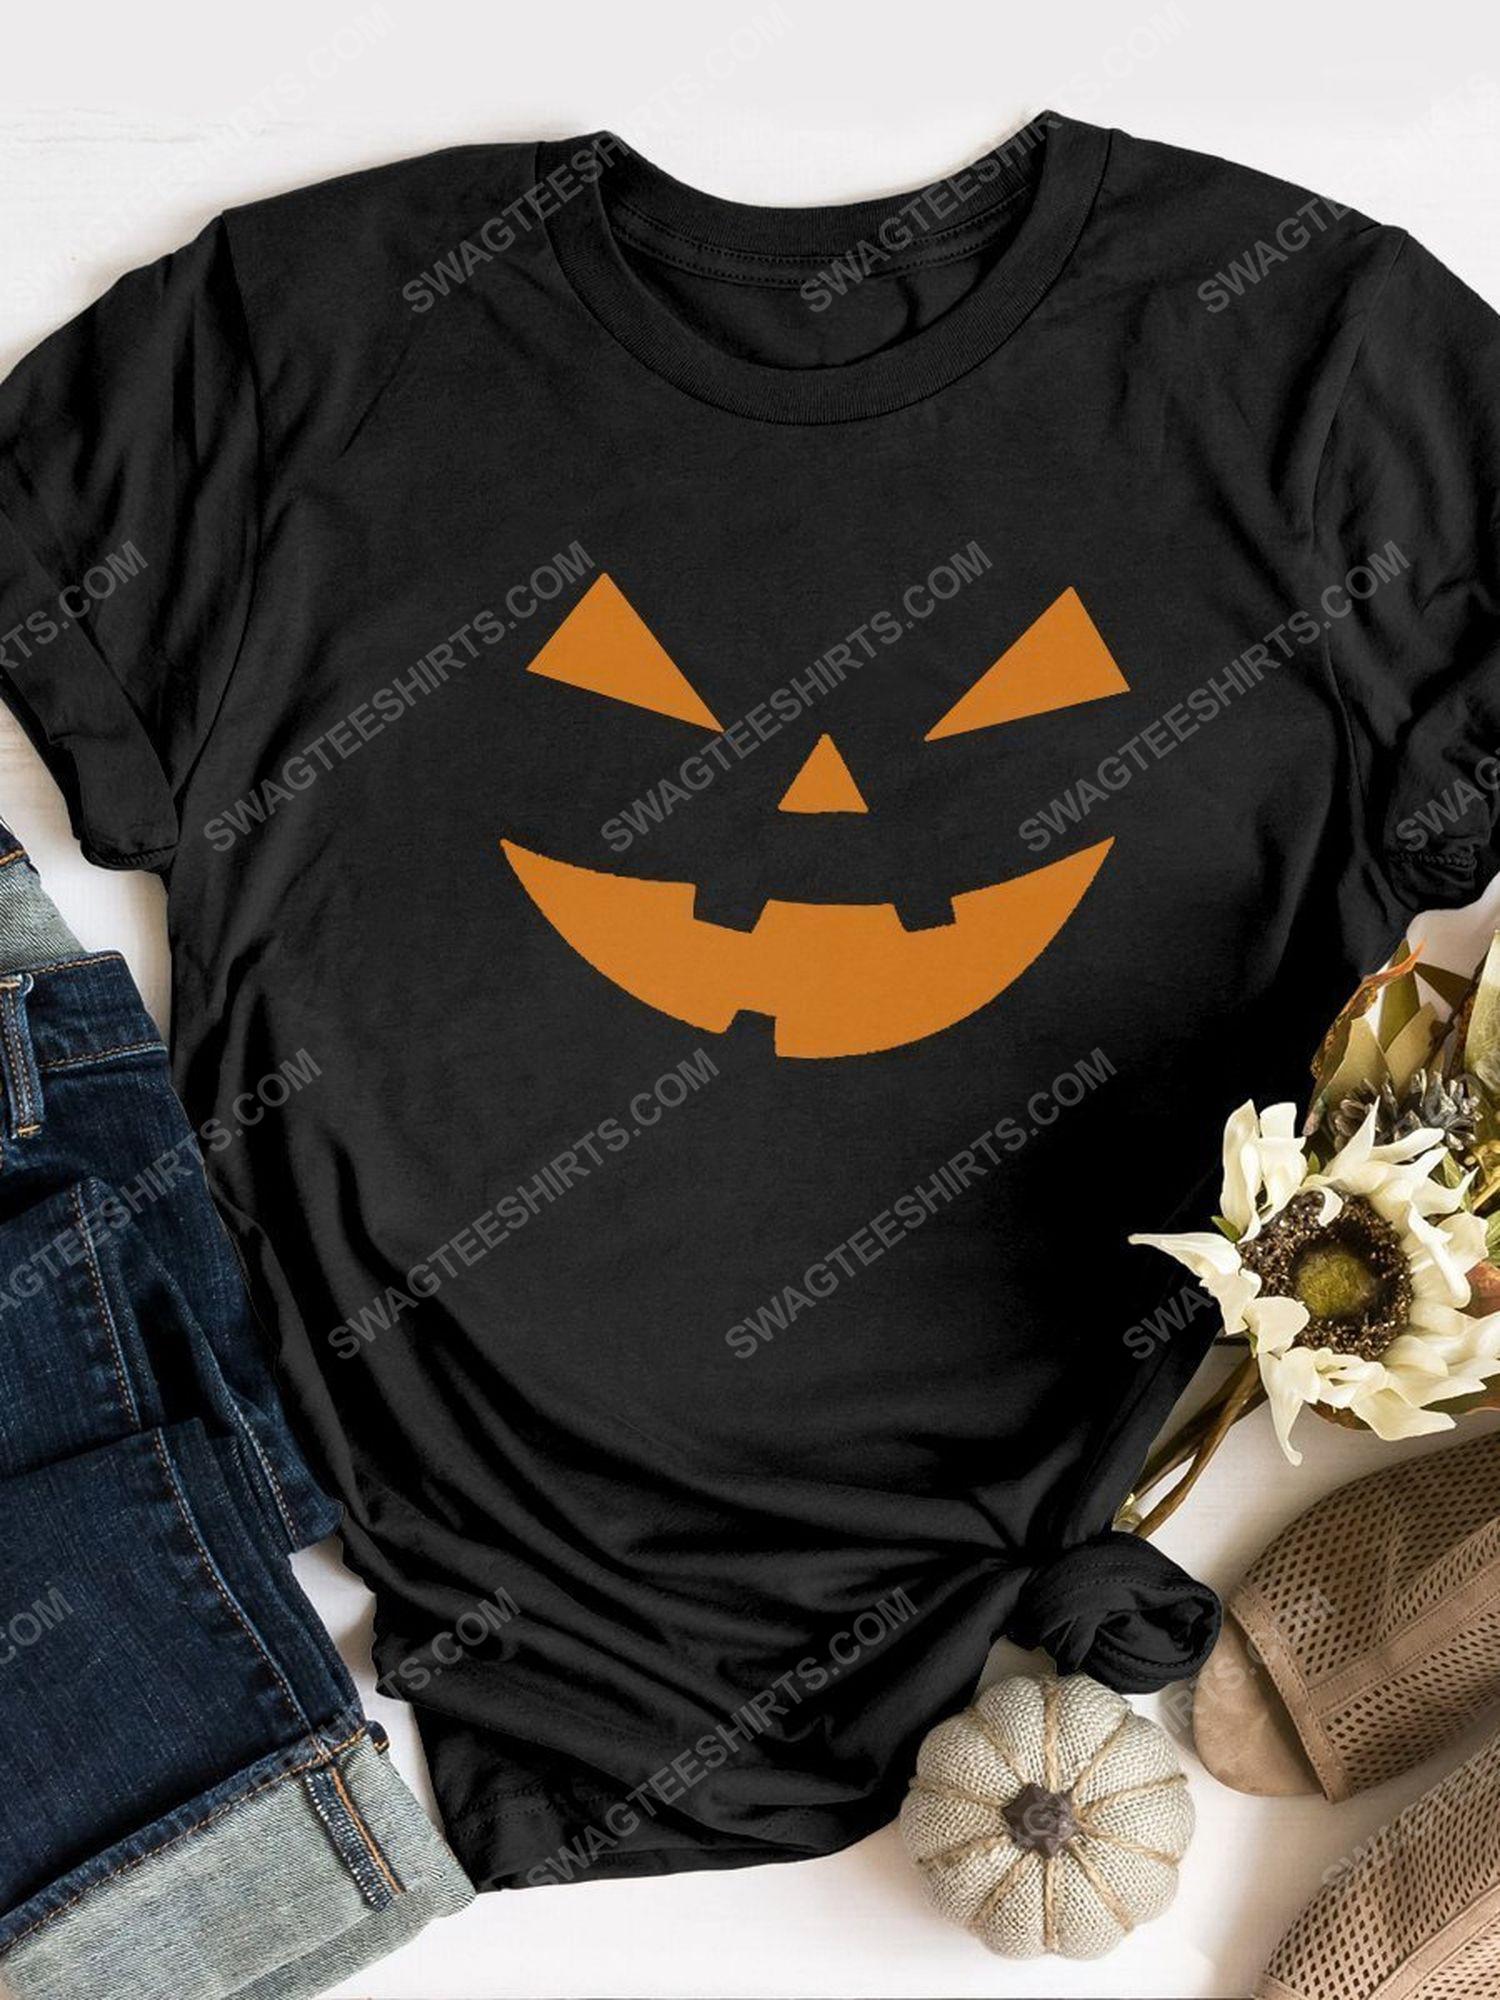 Halloween night and pumpkin face shirt 1 - Copy (2)